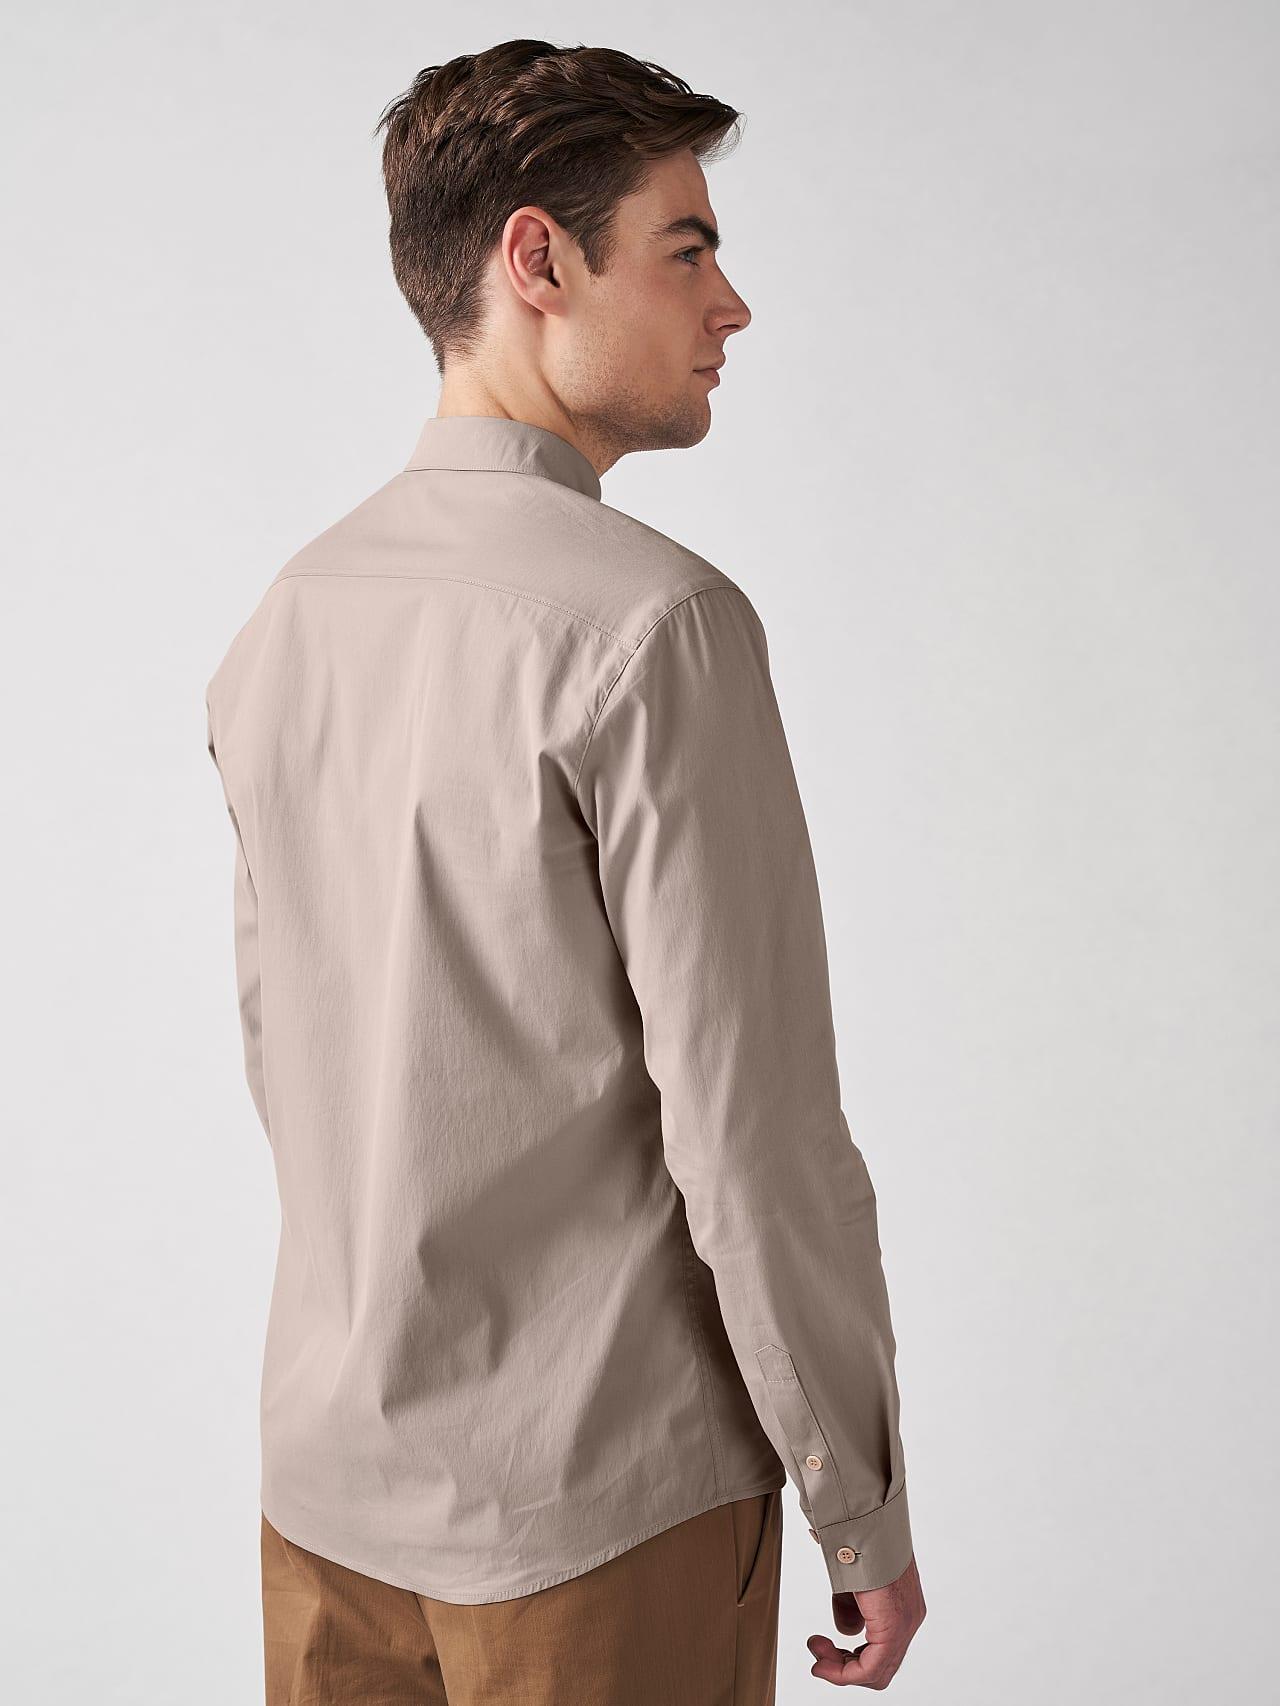 WAARG V1.Y5.01 Cotton-Stretch Shirt Sand Front Main Alpha Tauri